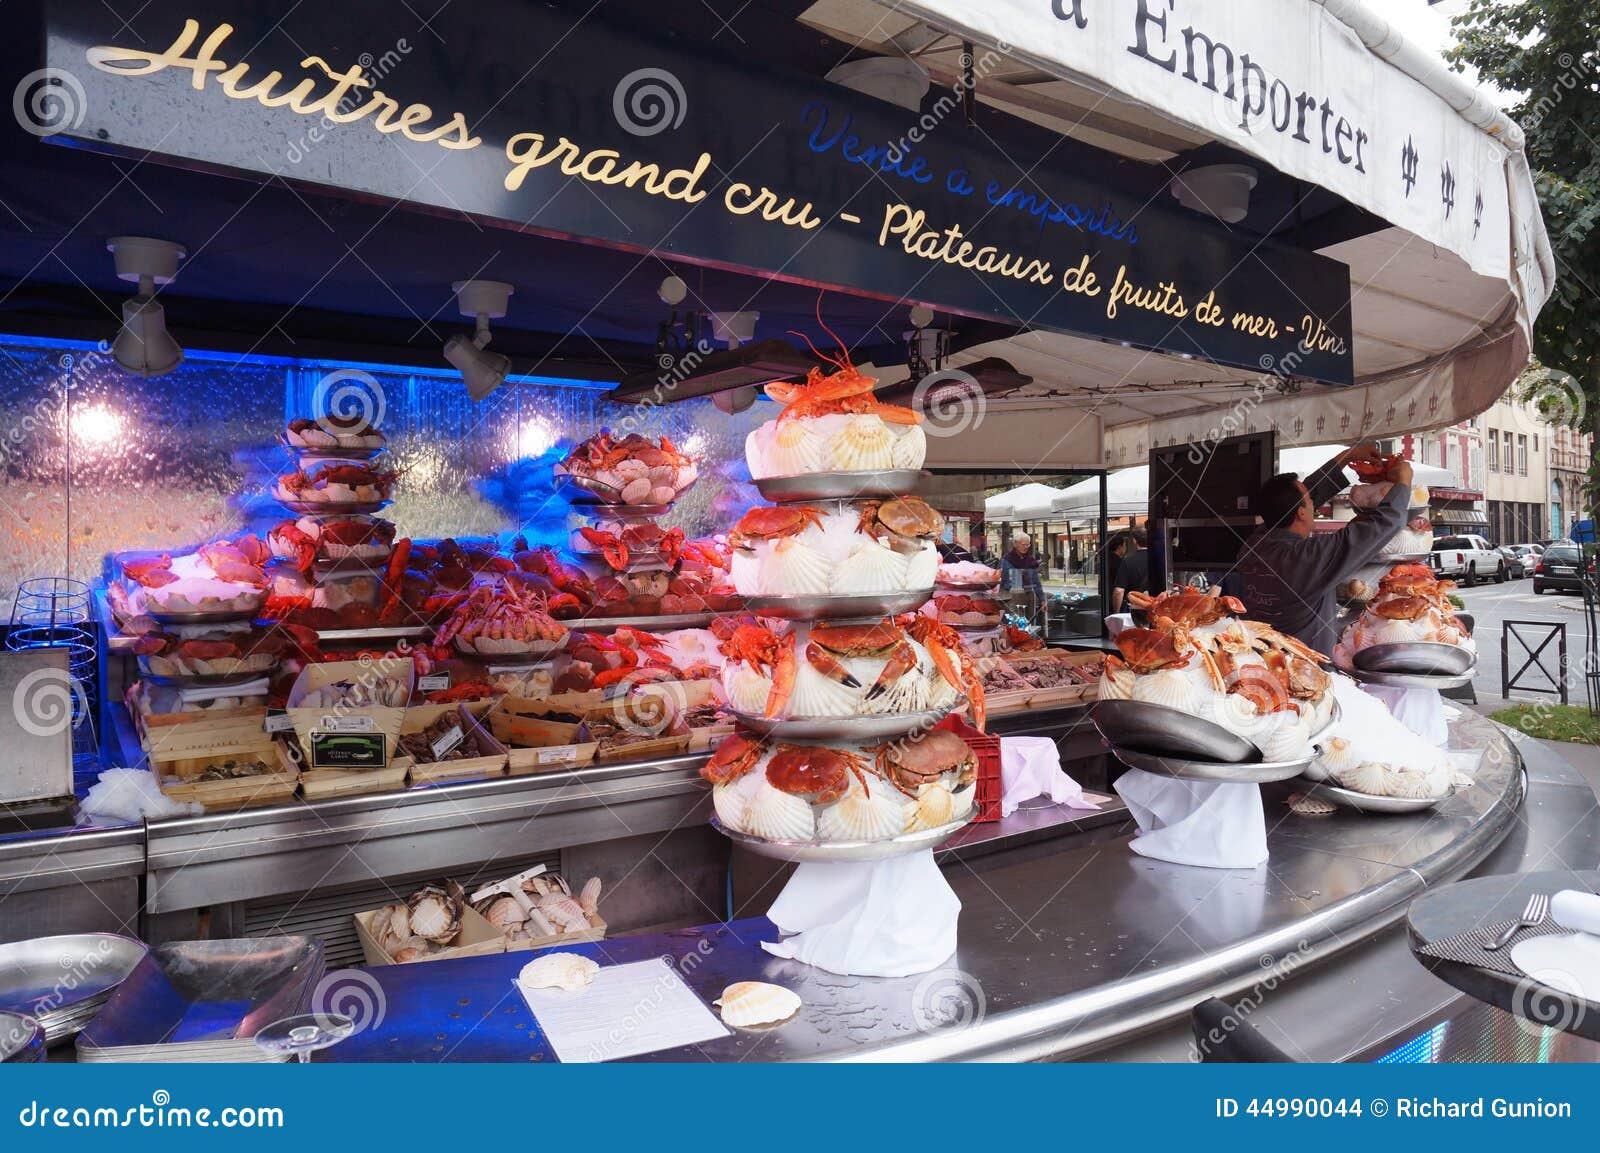 La Forge Restaurant Paris